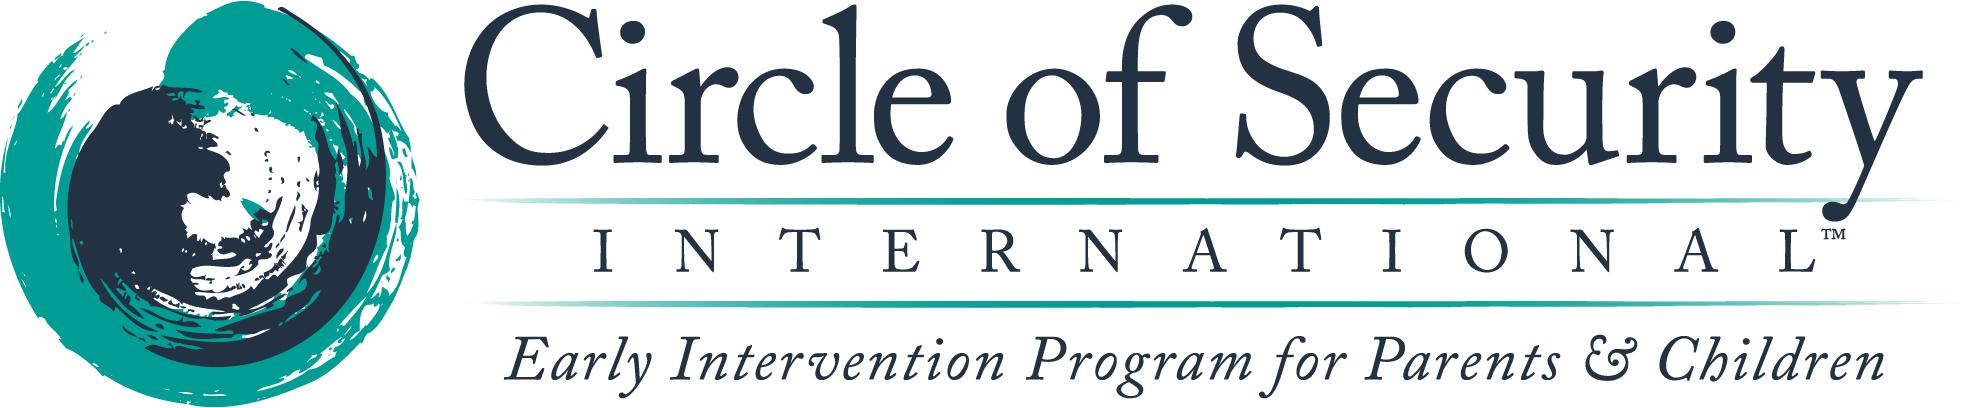 Circle of Security logo